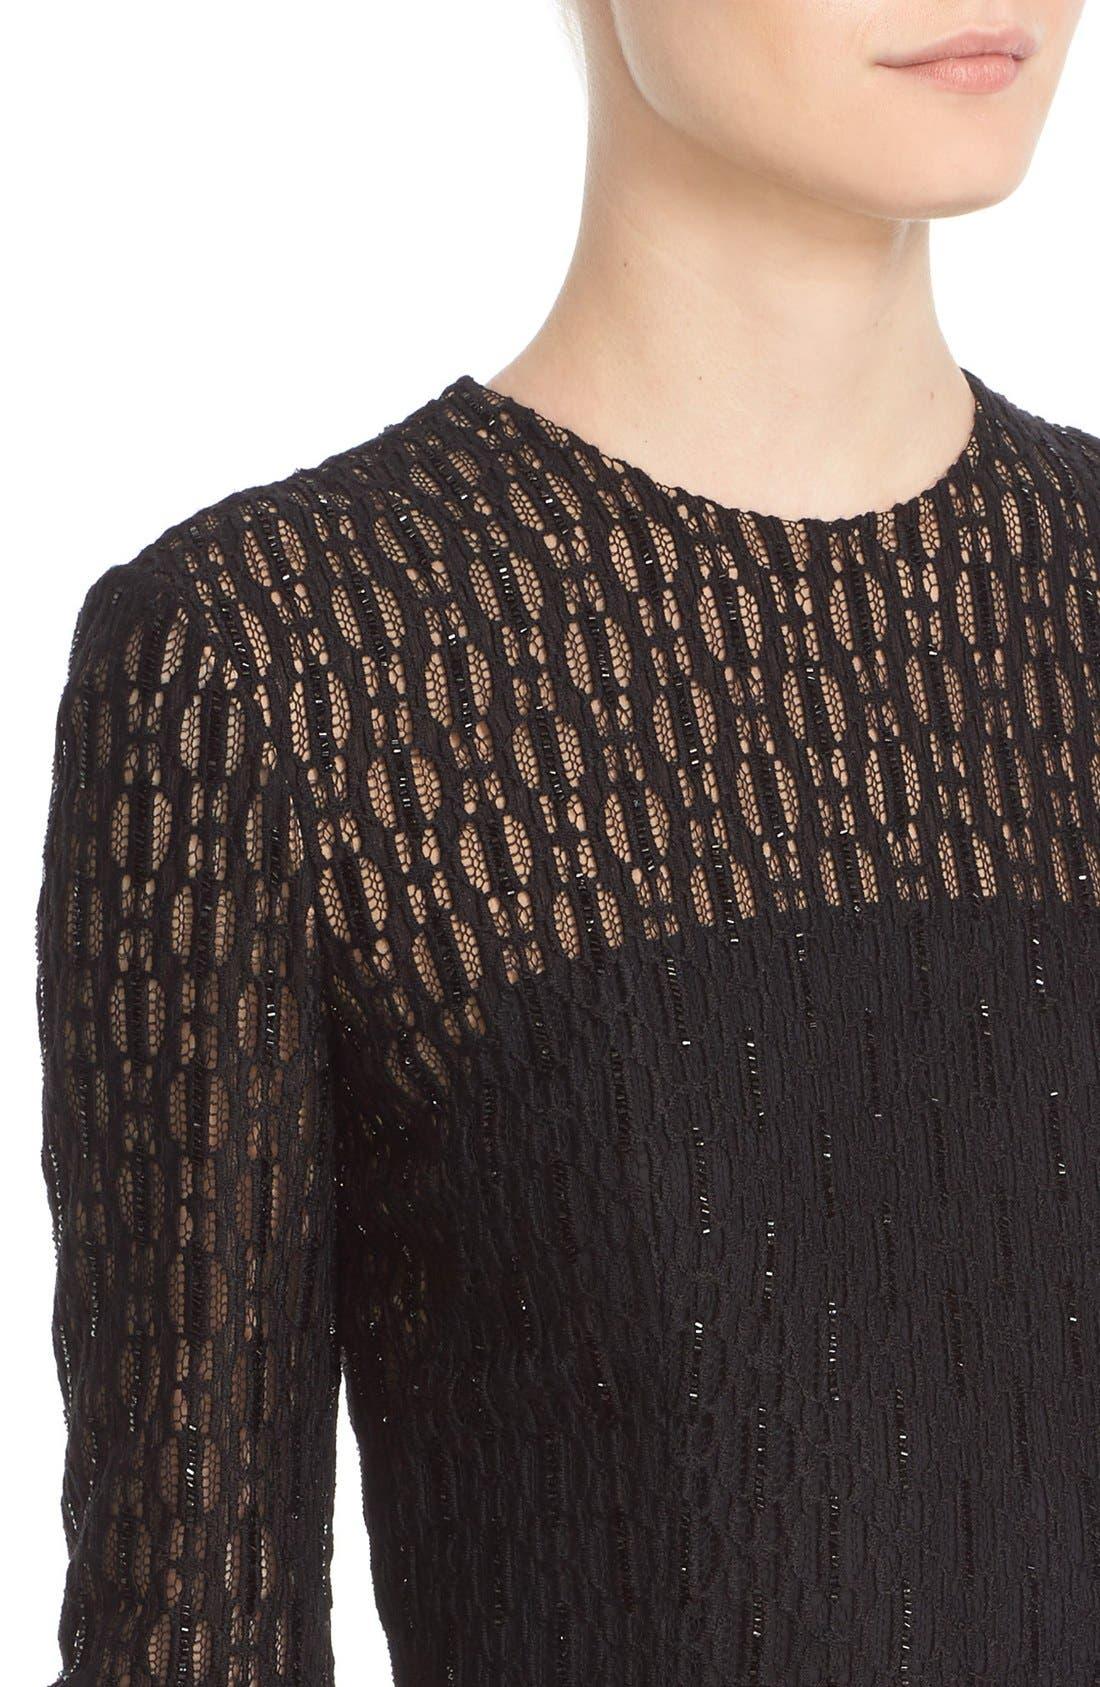 Embellished Illusion Lace Knit Sheath Dress,                             Alternate thumbnail 6, color,                             001